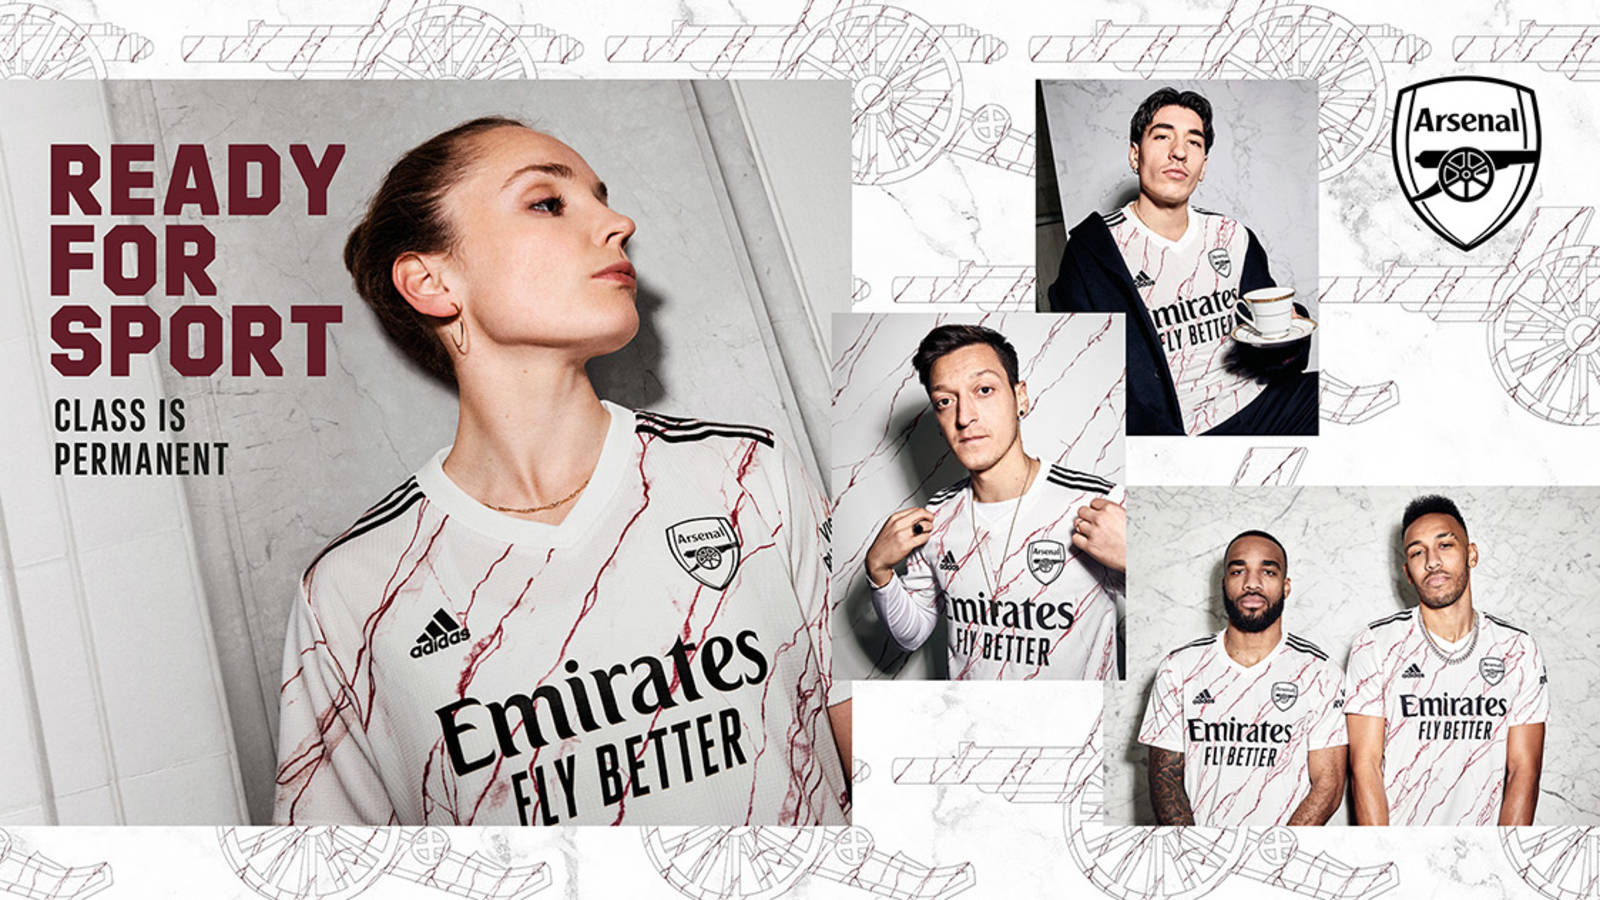 the new adidas x arsenal away kit